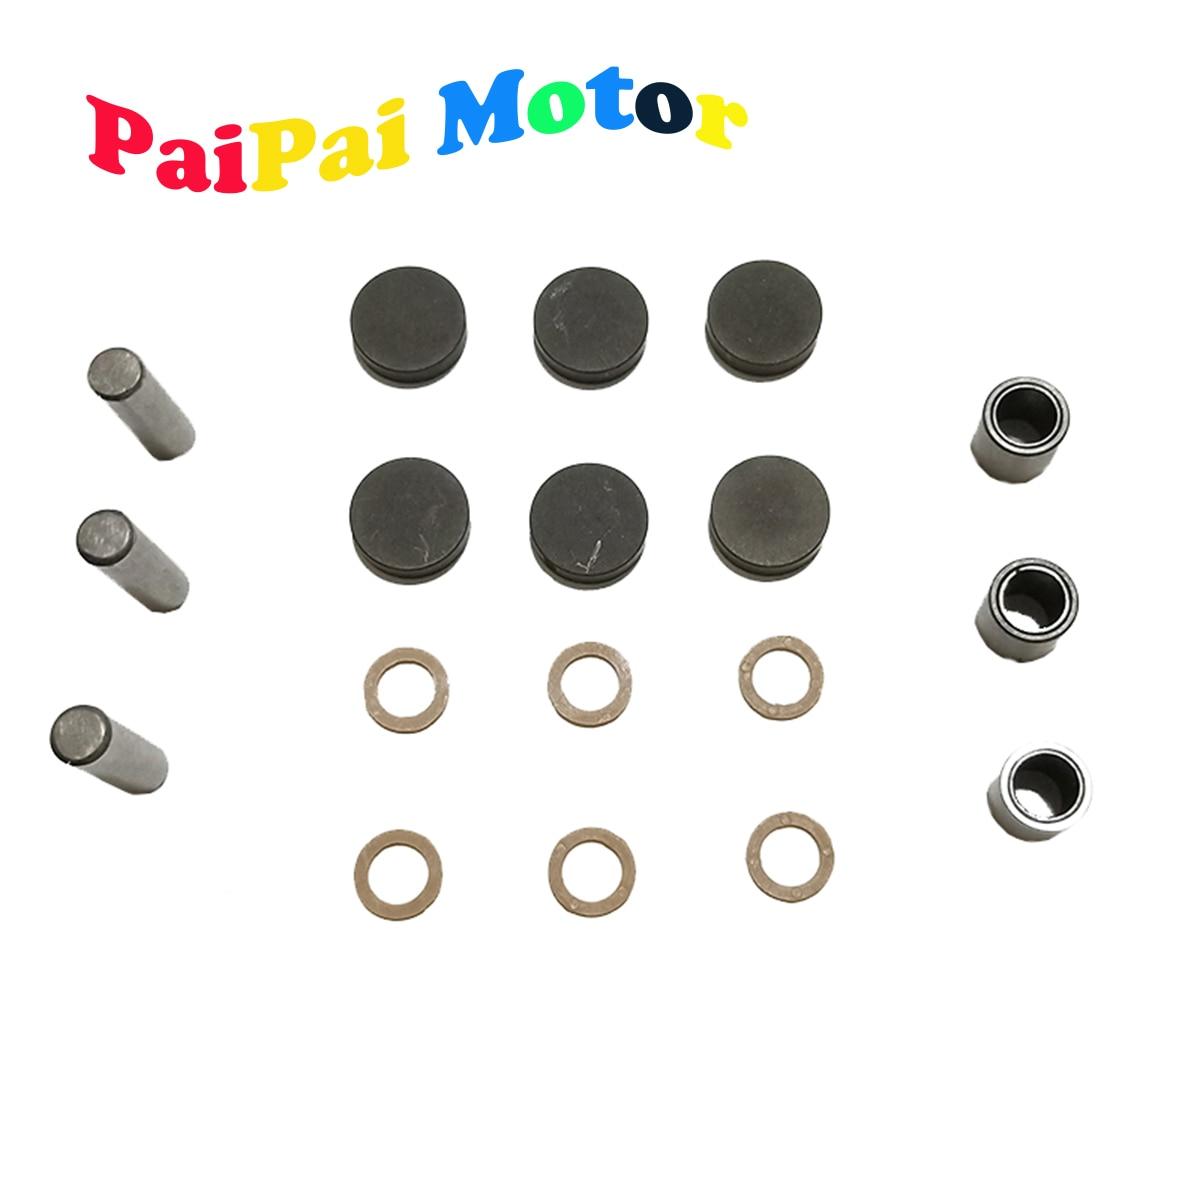 Polaris RZR 1000 XP Primary Clutch Rebuild Kit Weight Pin Roller Washer Rods Set enlarge